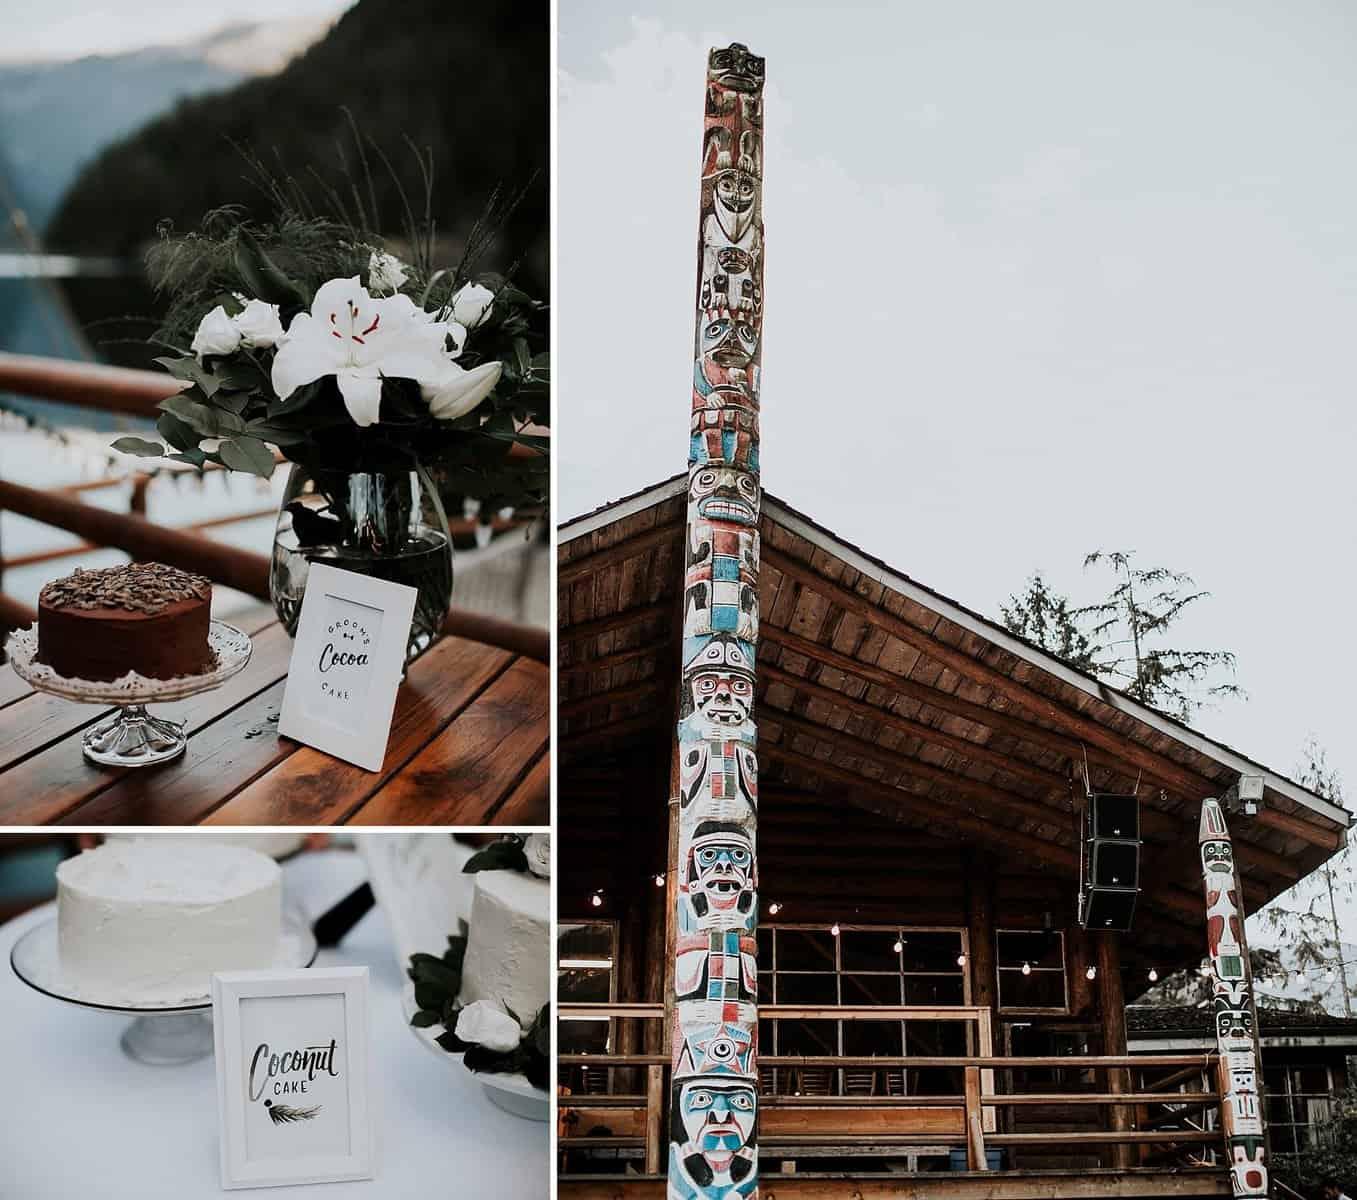 malibu-british-columbia-canada-pacific-northwest-wedding-0051